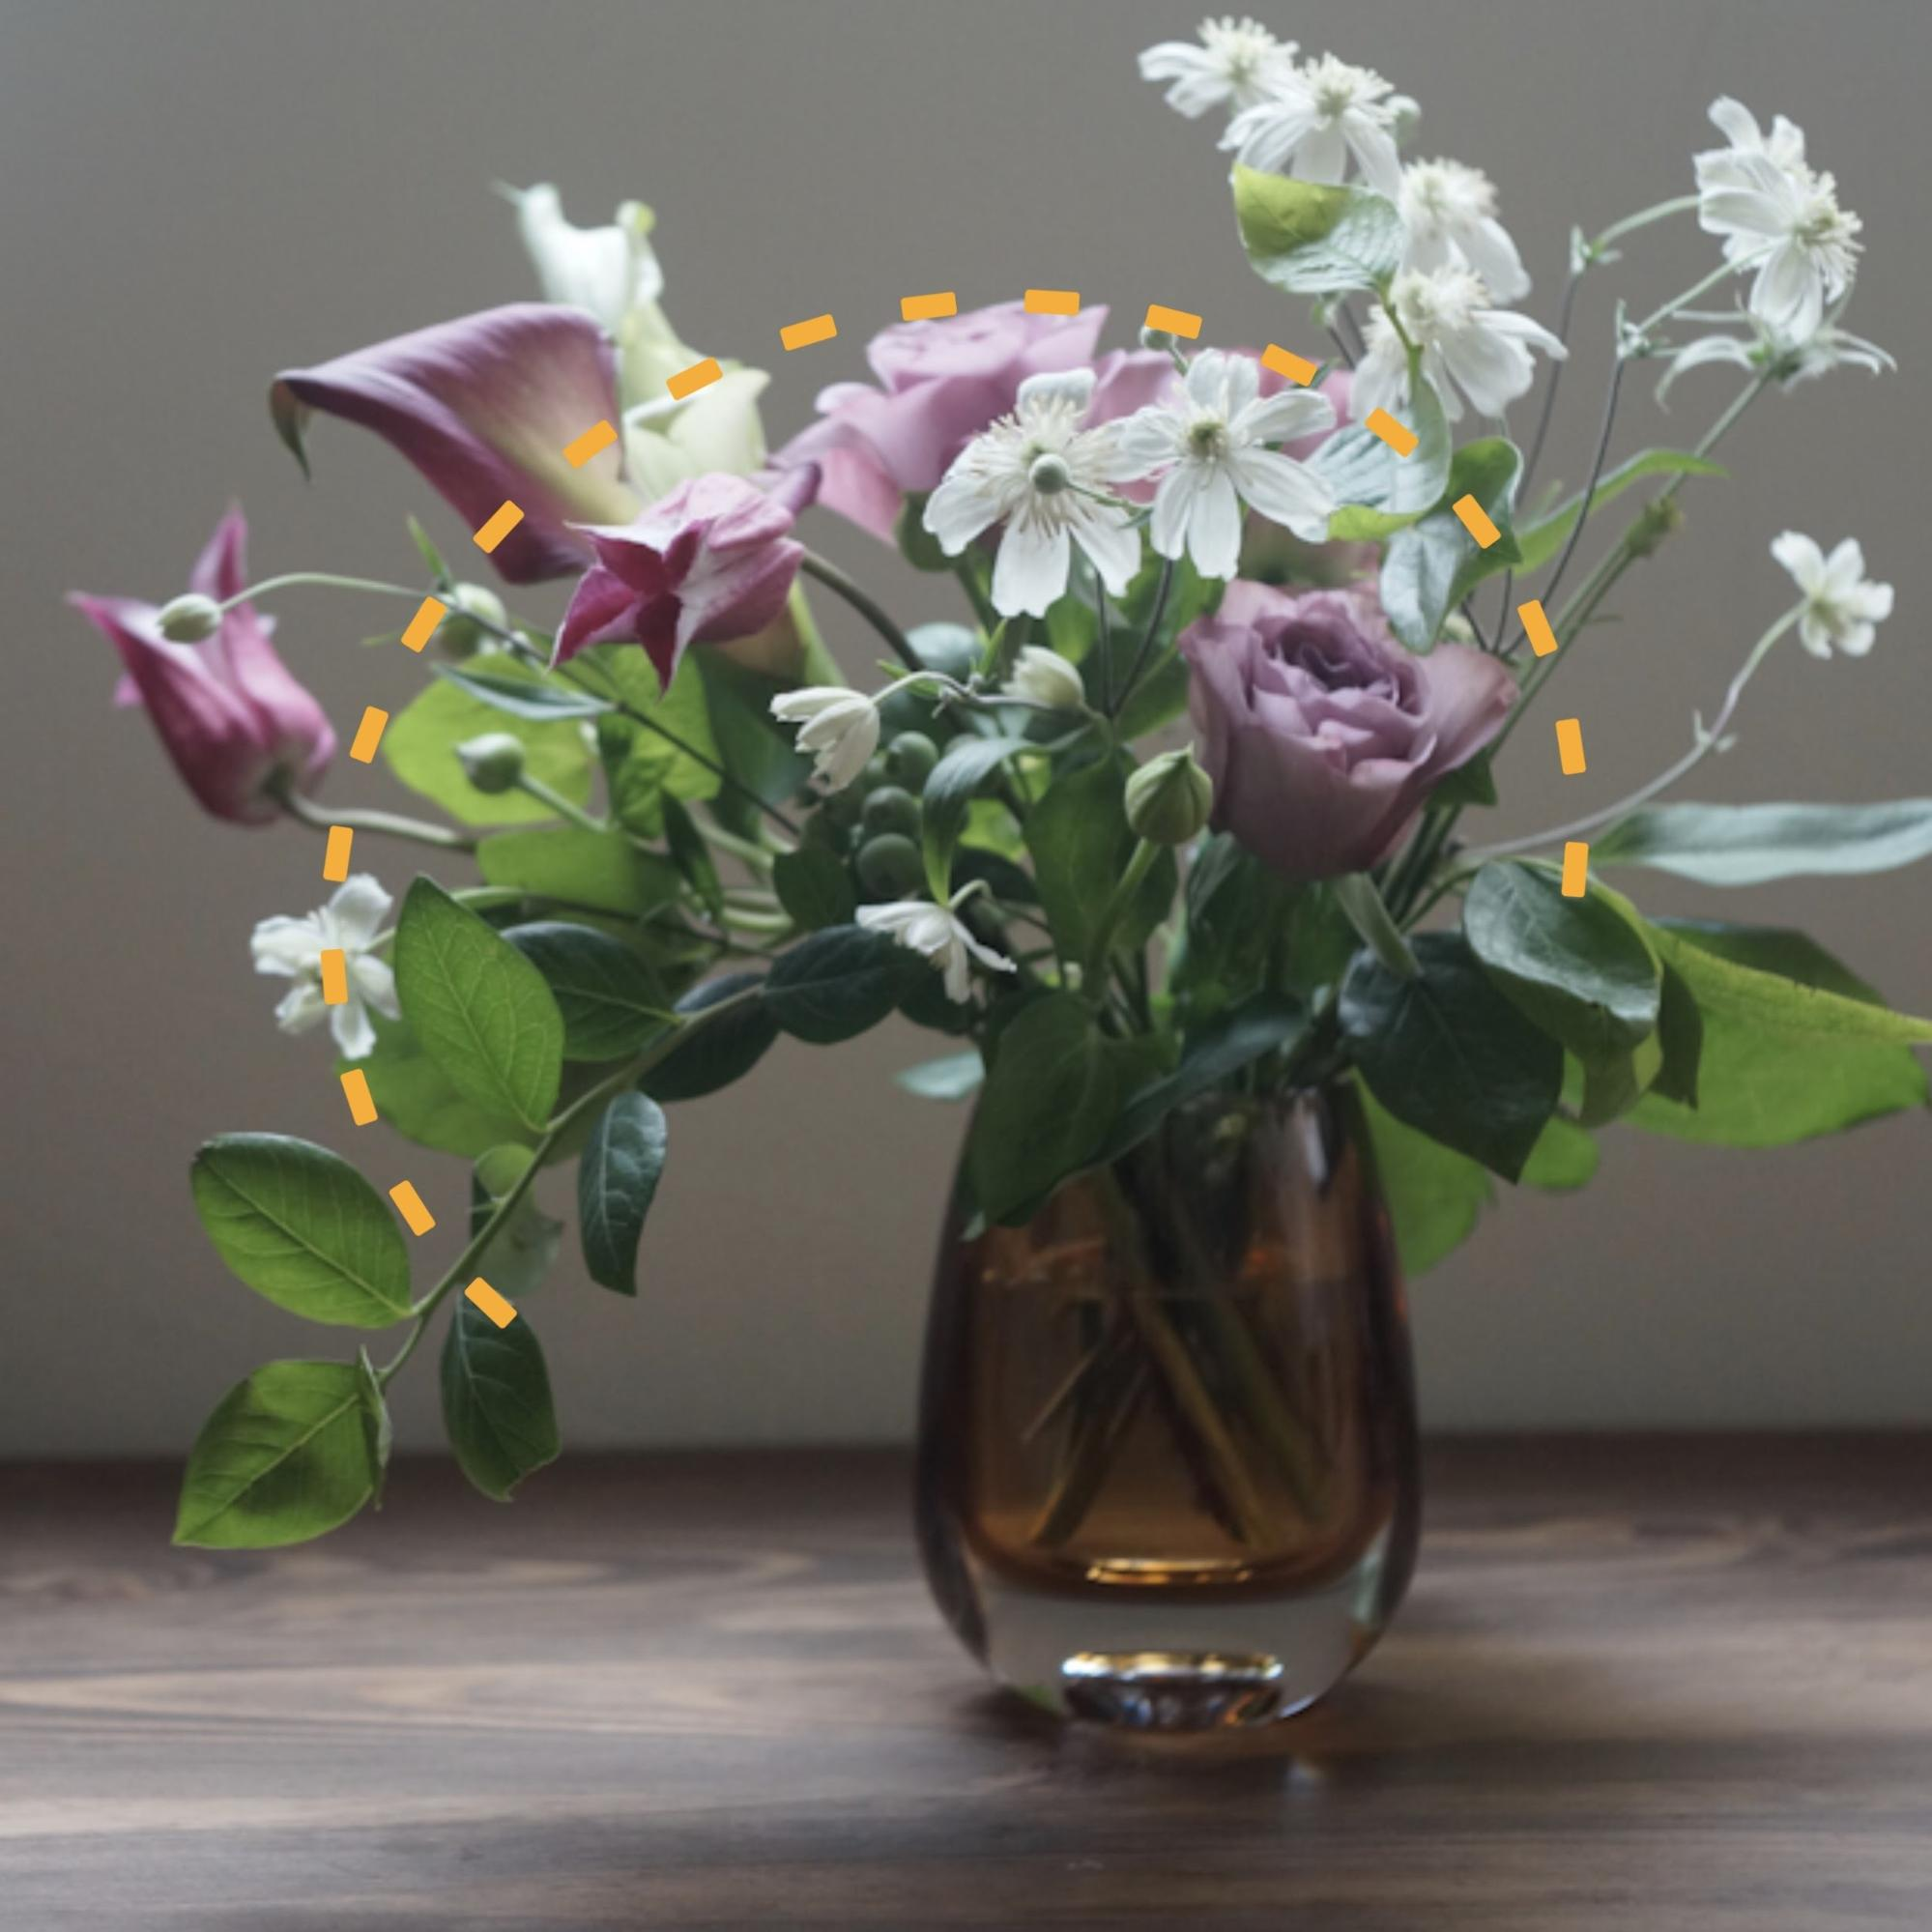 mimi・花の個性とバランスを楽しむ